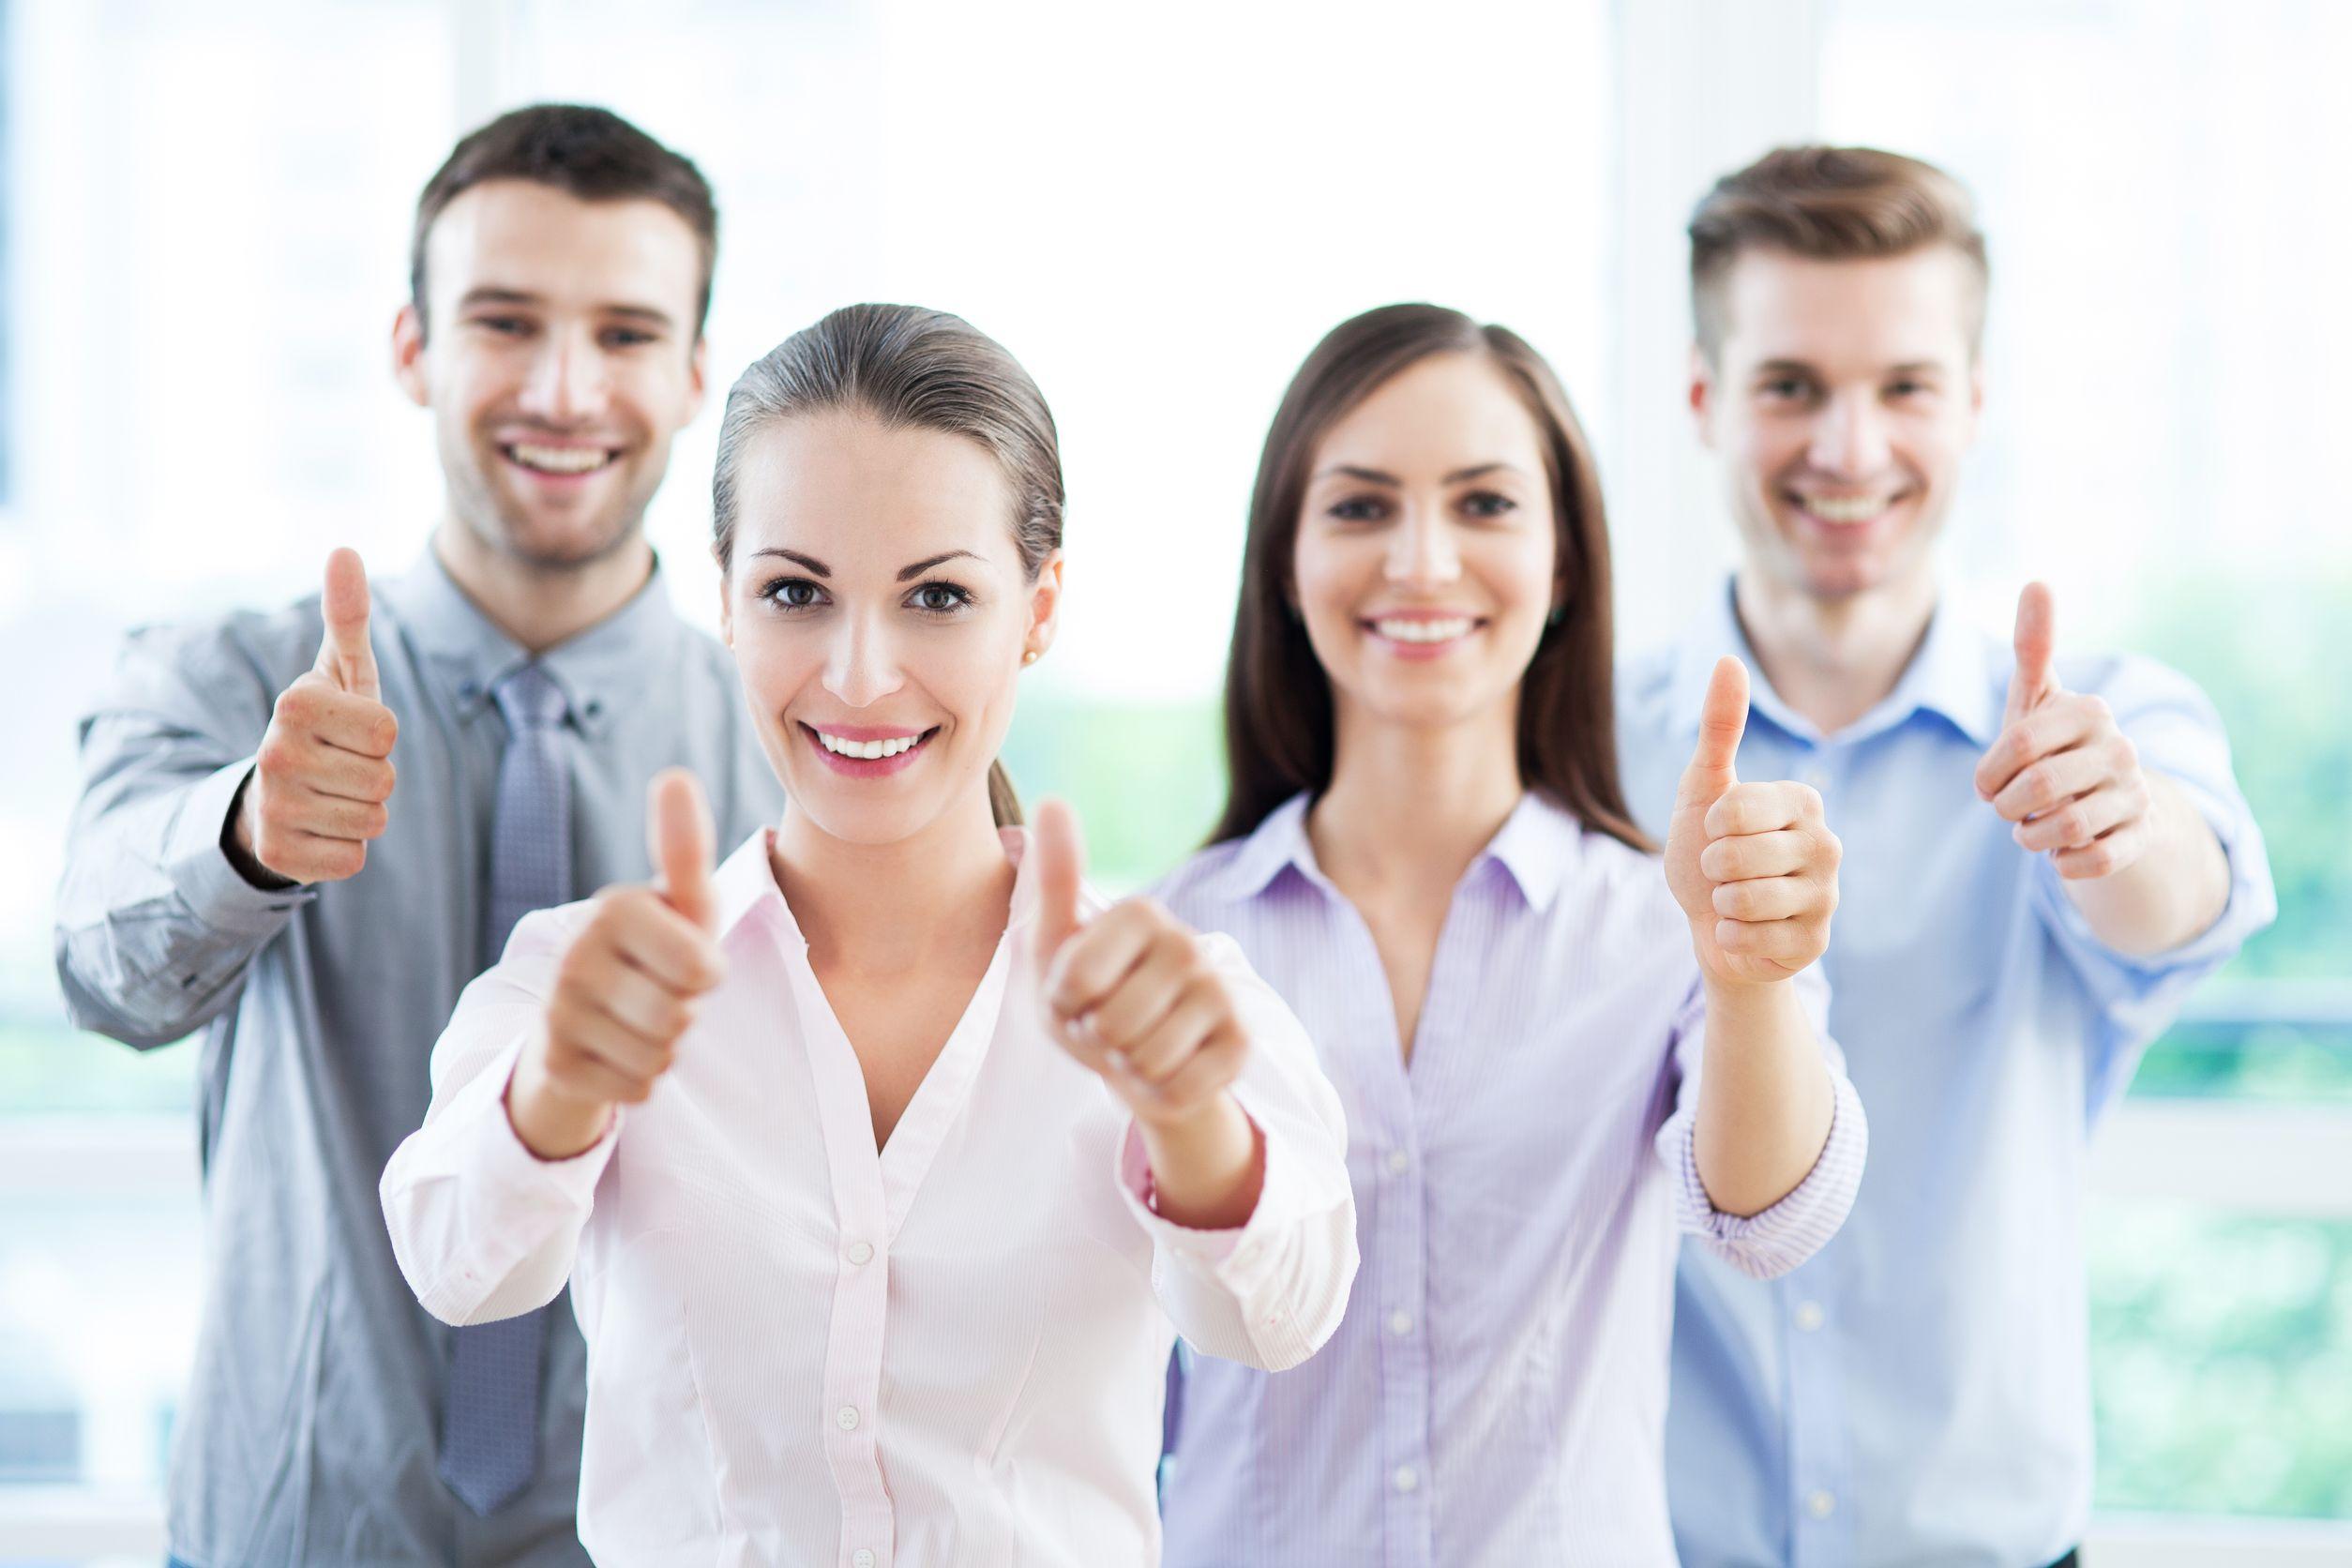 _SAP HCM (PY) Inhouse Senior Consultant (m/w/d)_